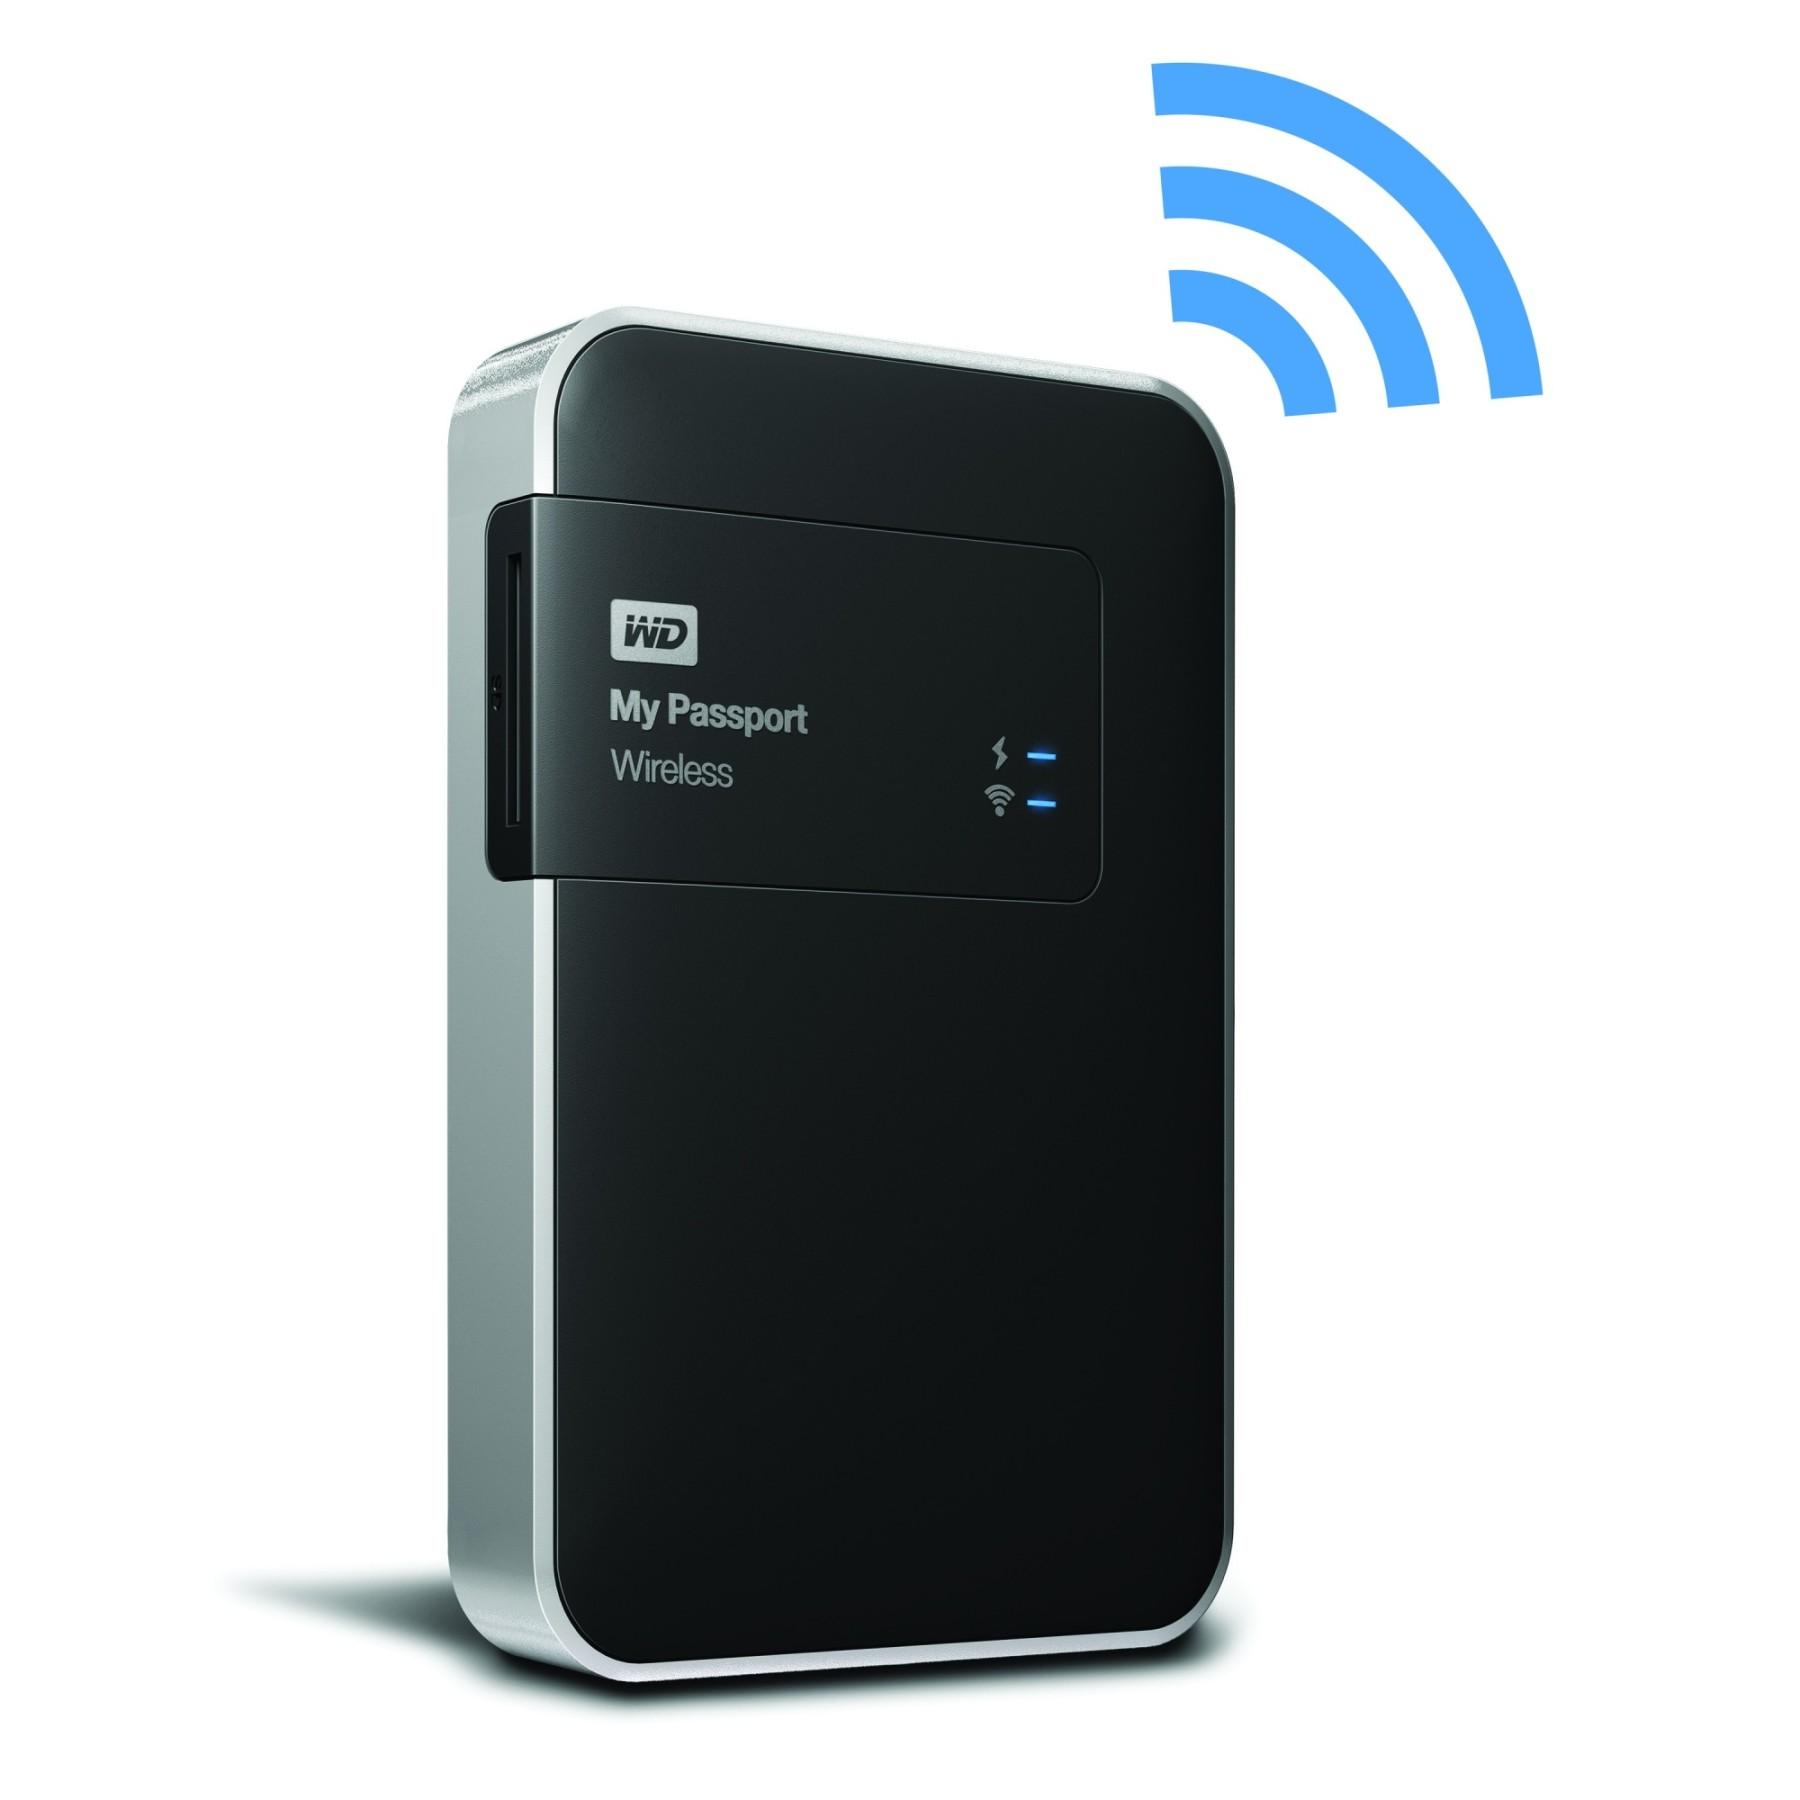 Wd 1tb my passport wireless 2 5 usb 3 0 external portable - Porta hard disk esterno 2 5 ...